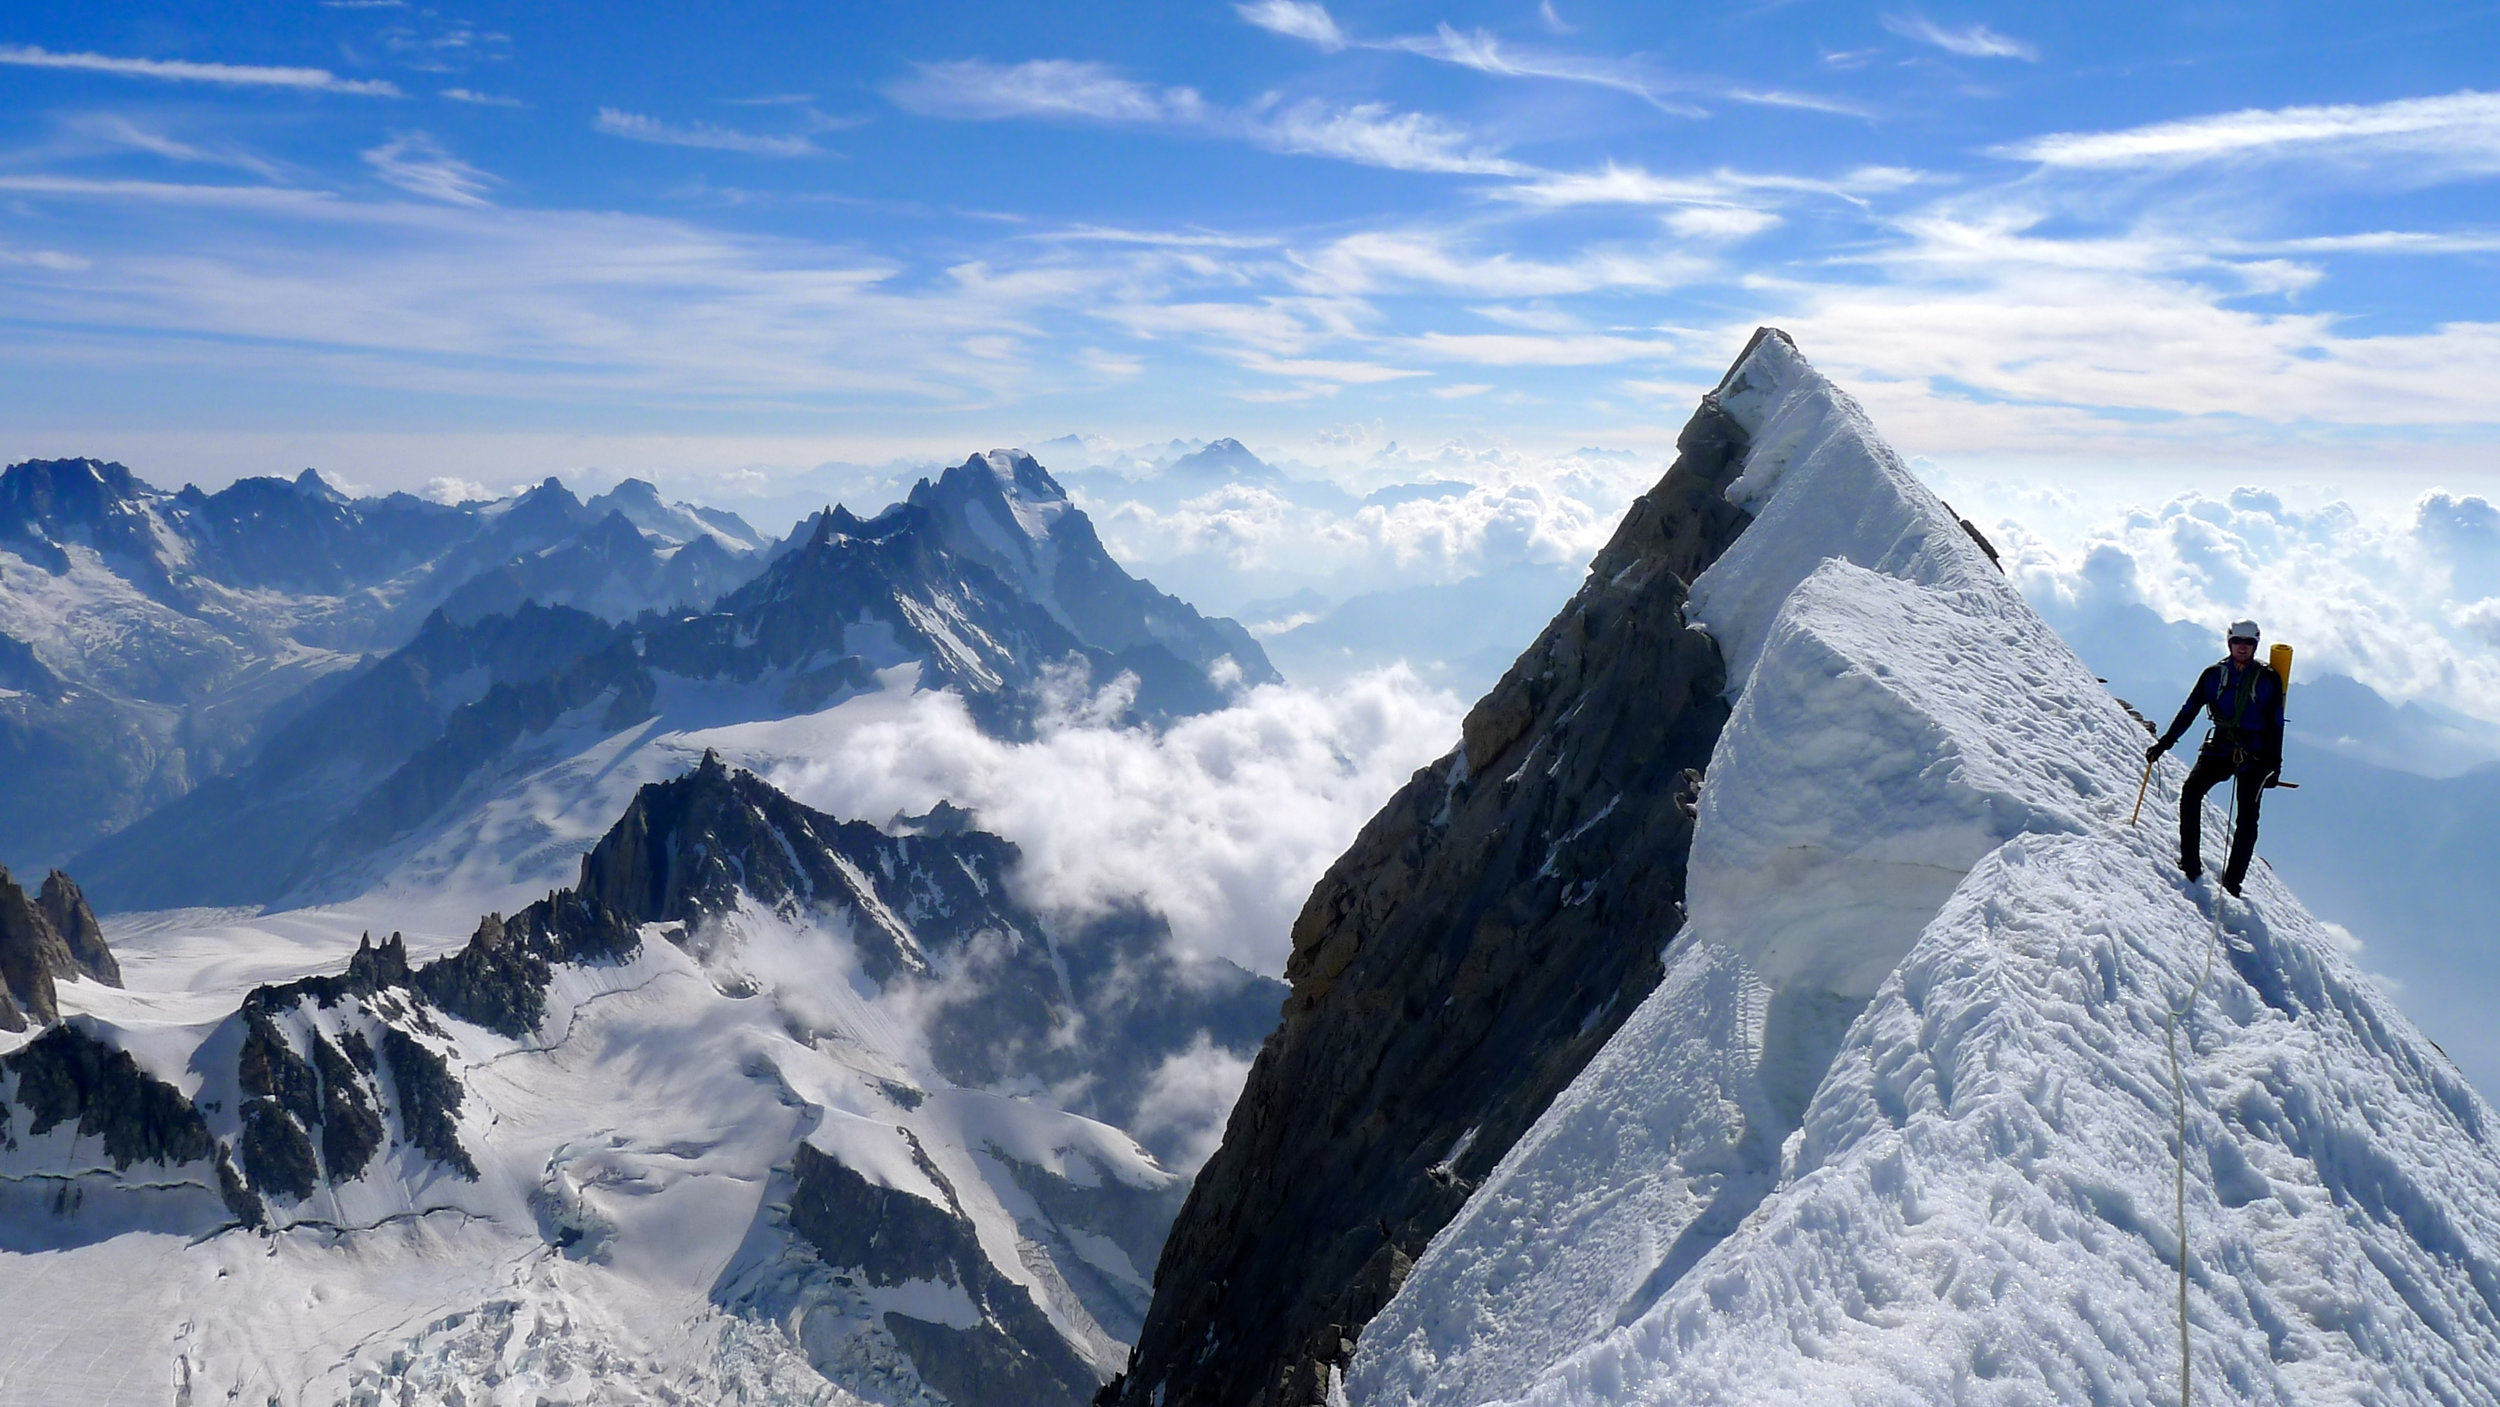 Matthew Pigden on the Peuteray Integrale, Mont Blanc. Day 4